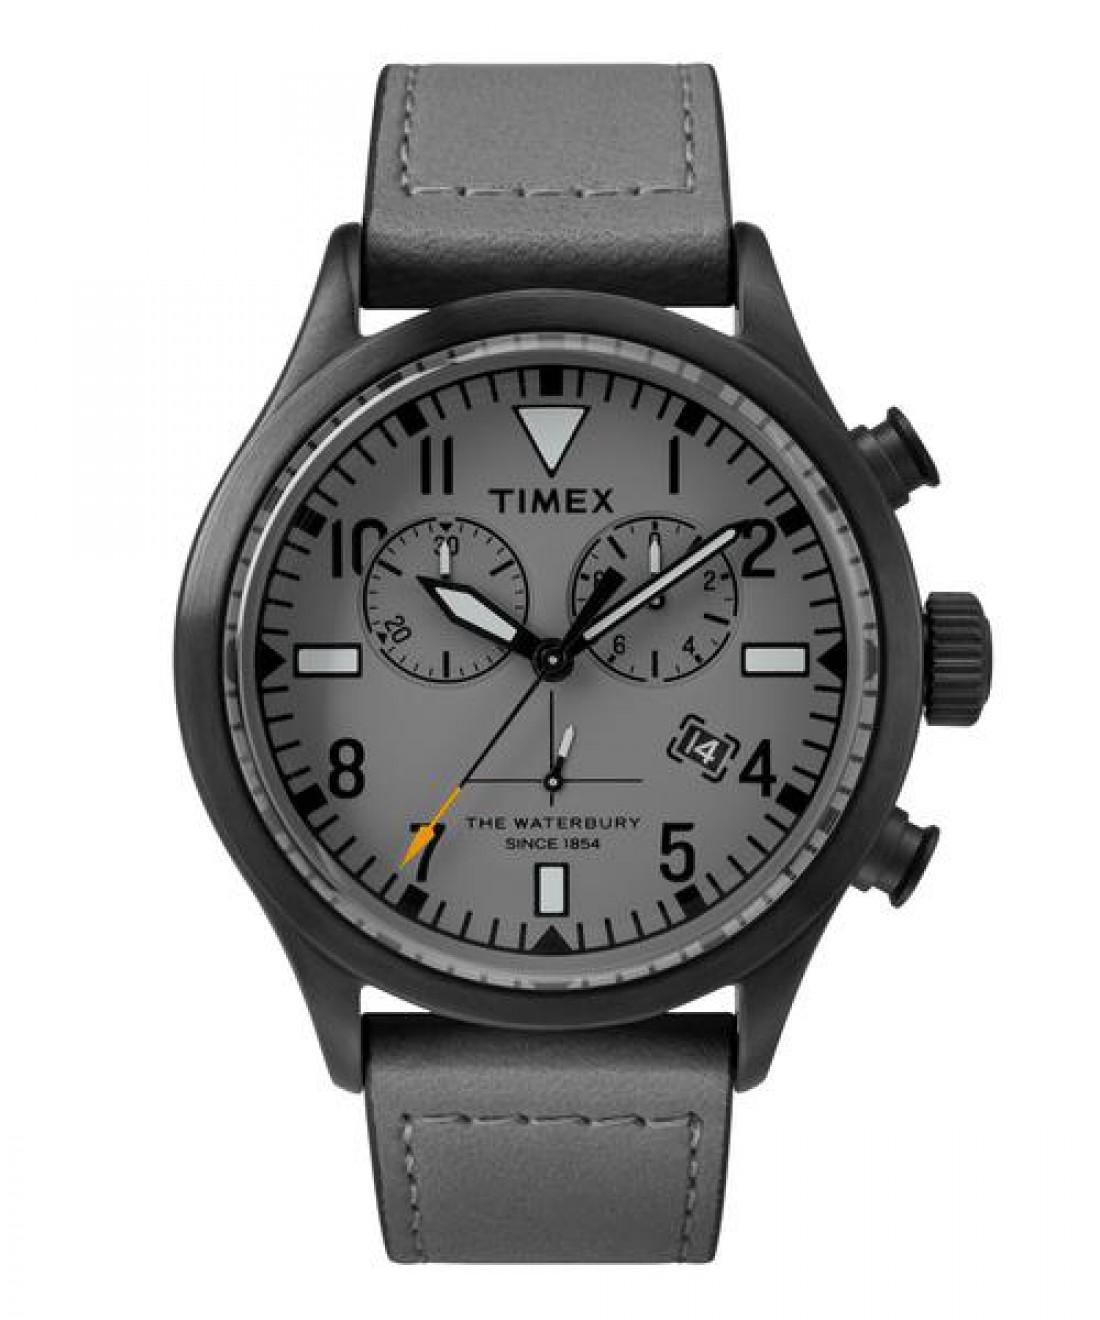 Timex Todd Snyder — $158